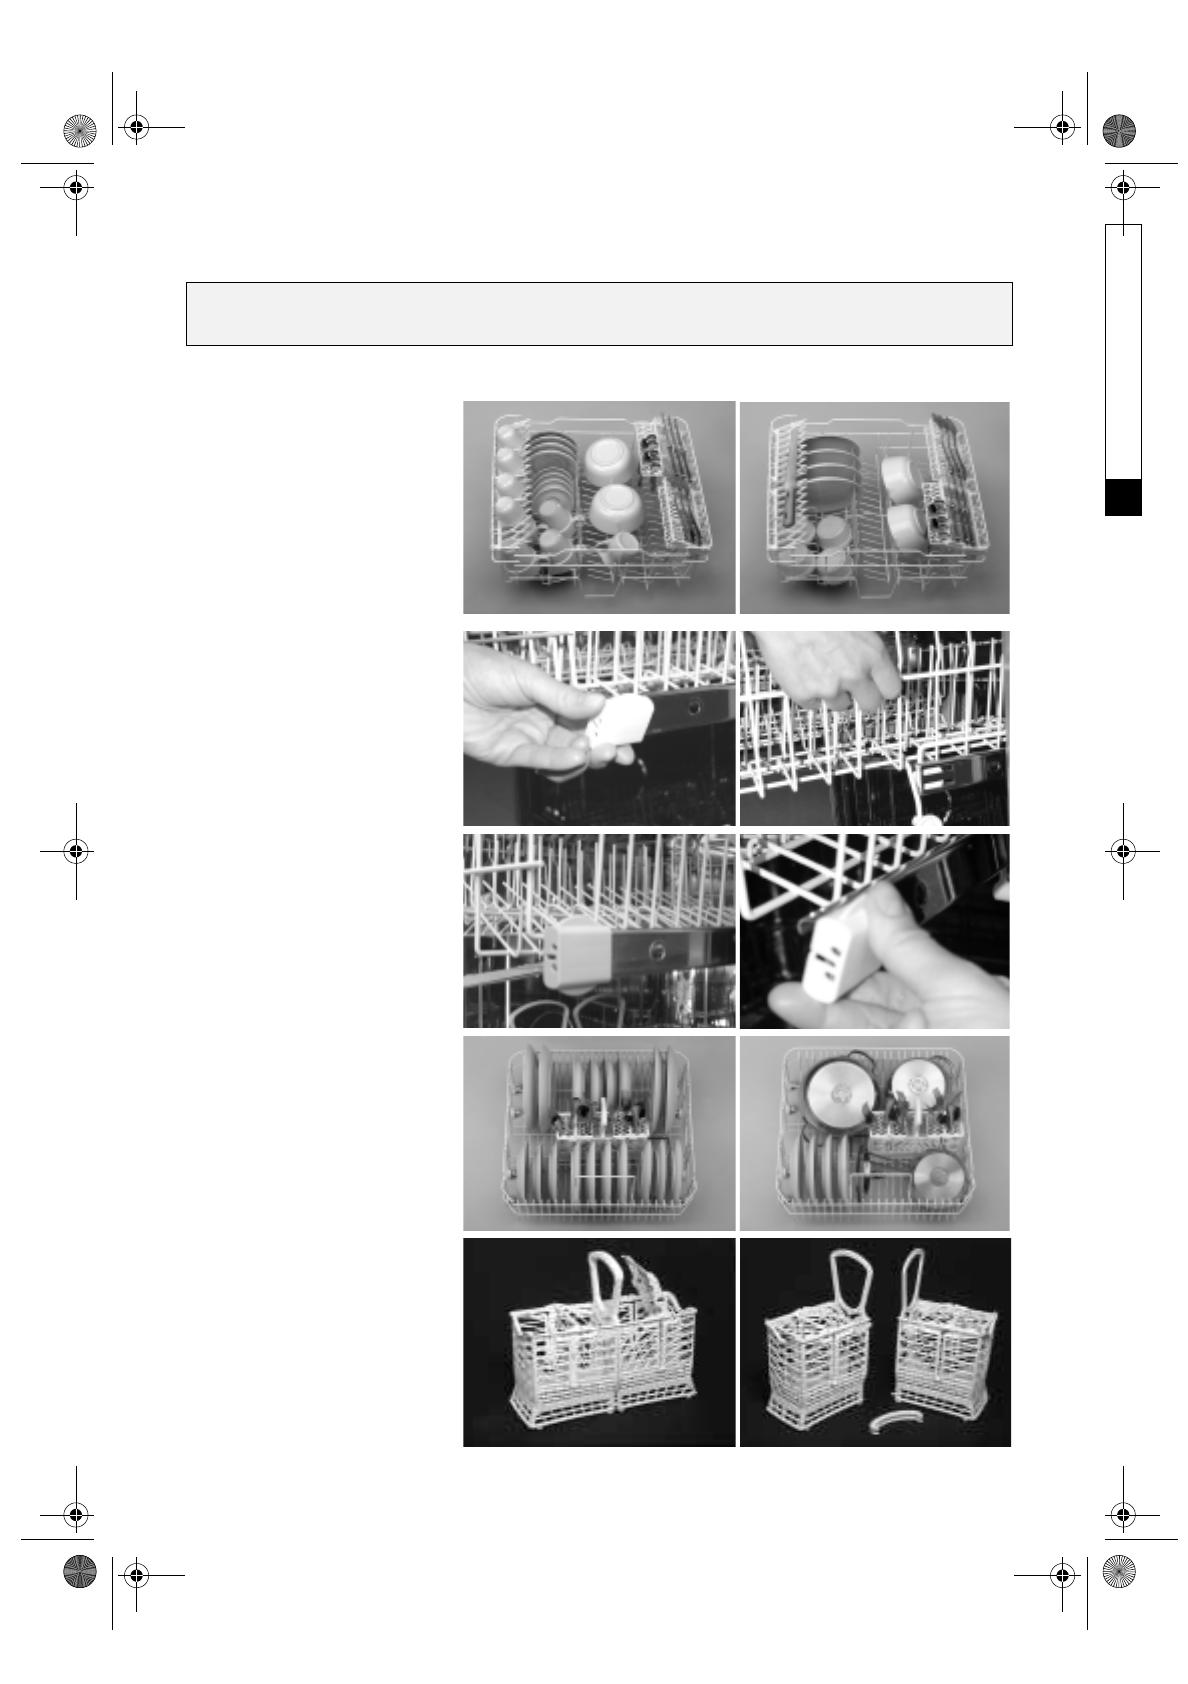 Handleiding whirlpool adg 3800 pagina 3 van 4 nederlands - Whirlpool van het interieur ...